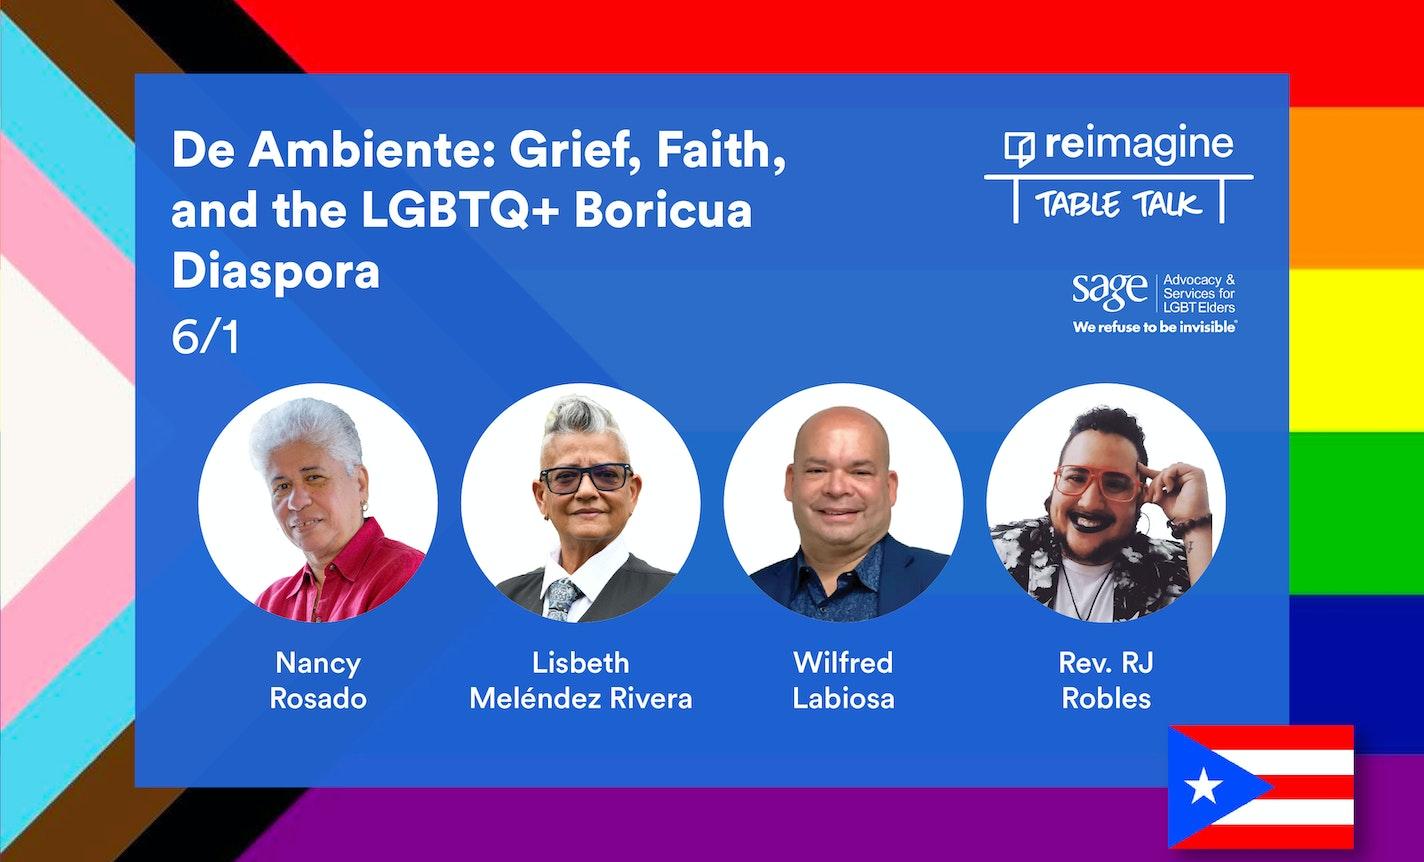 De Ambiente: Grief, Faith, and the LGBTQ+ Boricua Diaspora